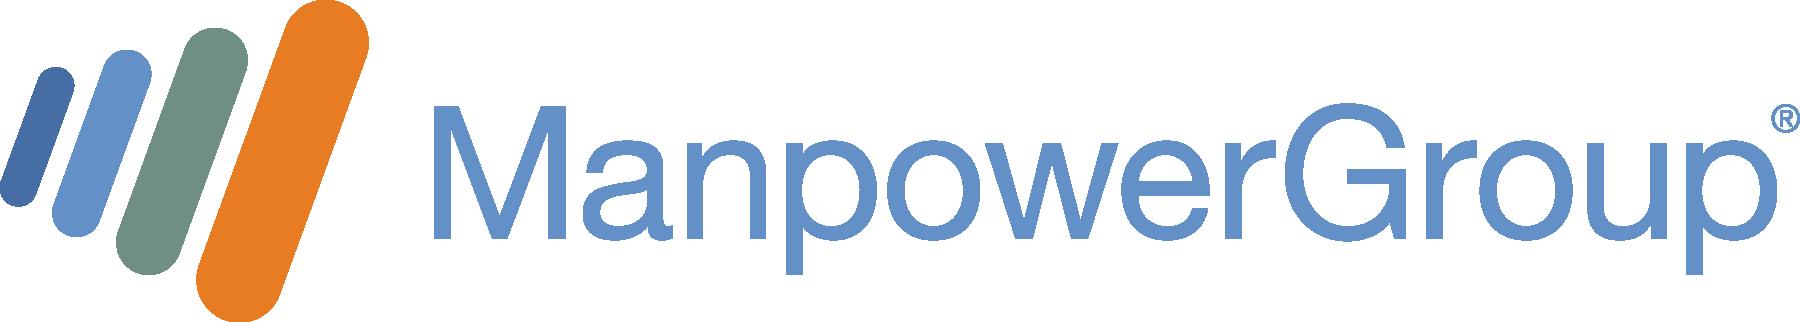 ManpowerGroup logo